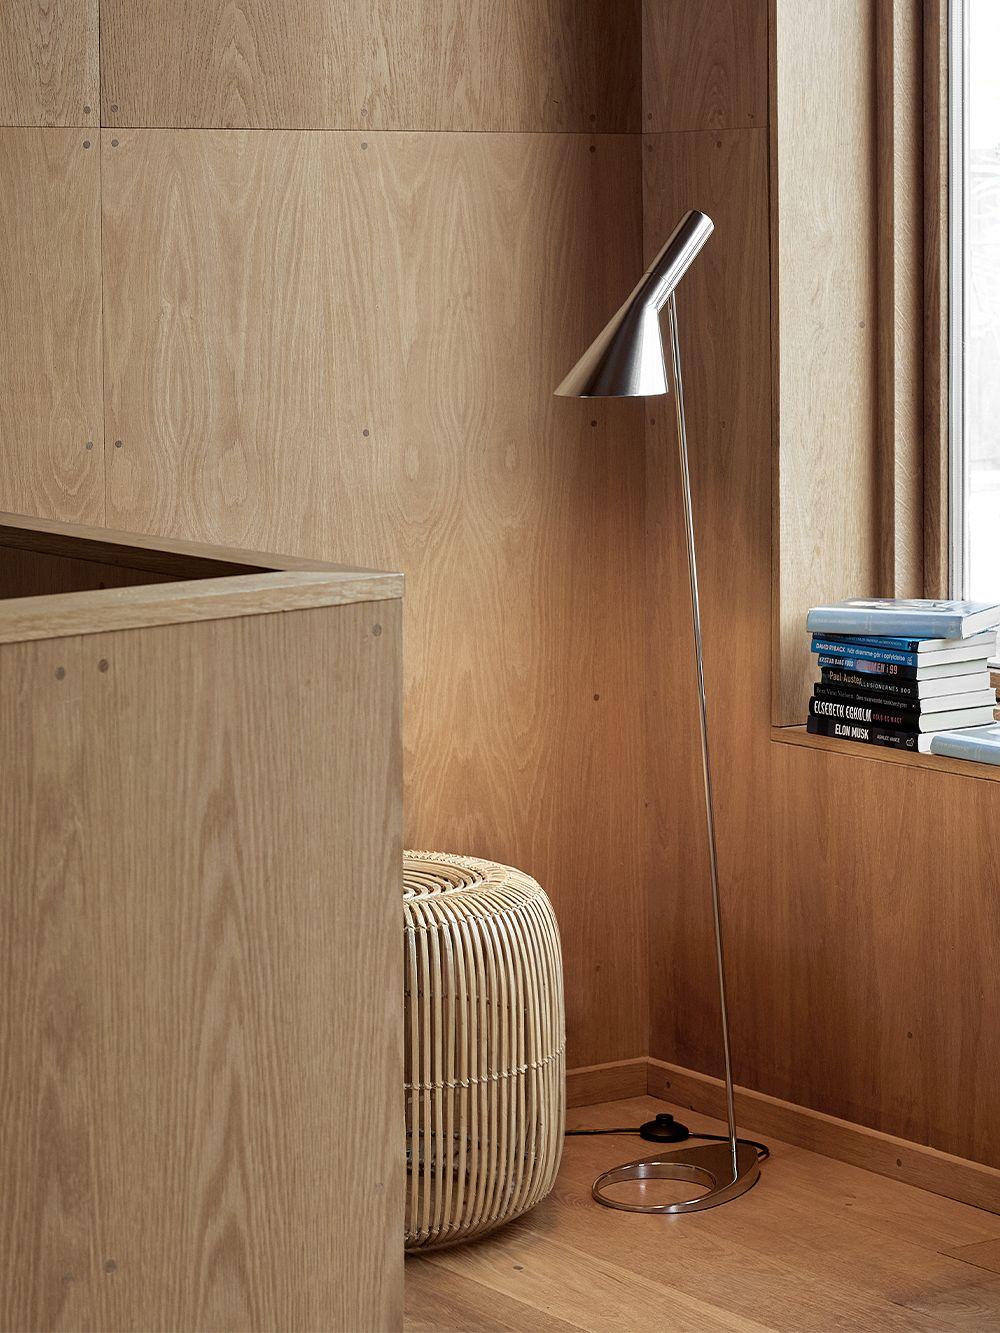 Louis Poulsen AJ floor lamp, polished stainless steel